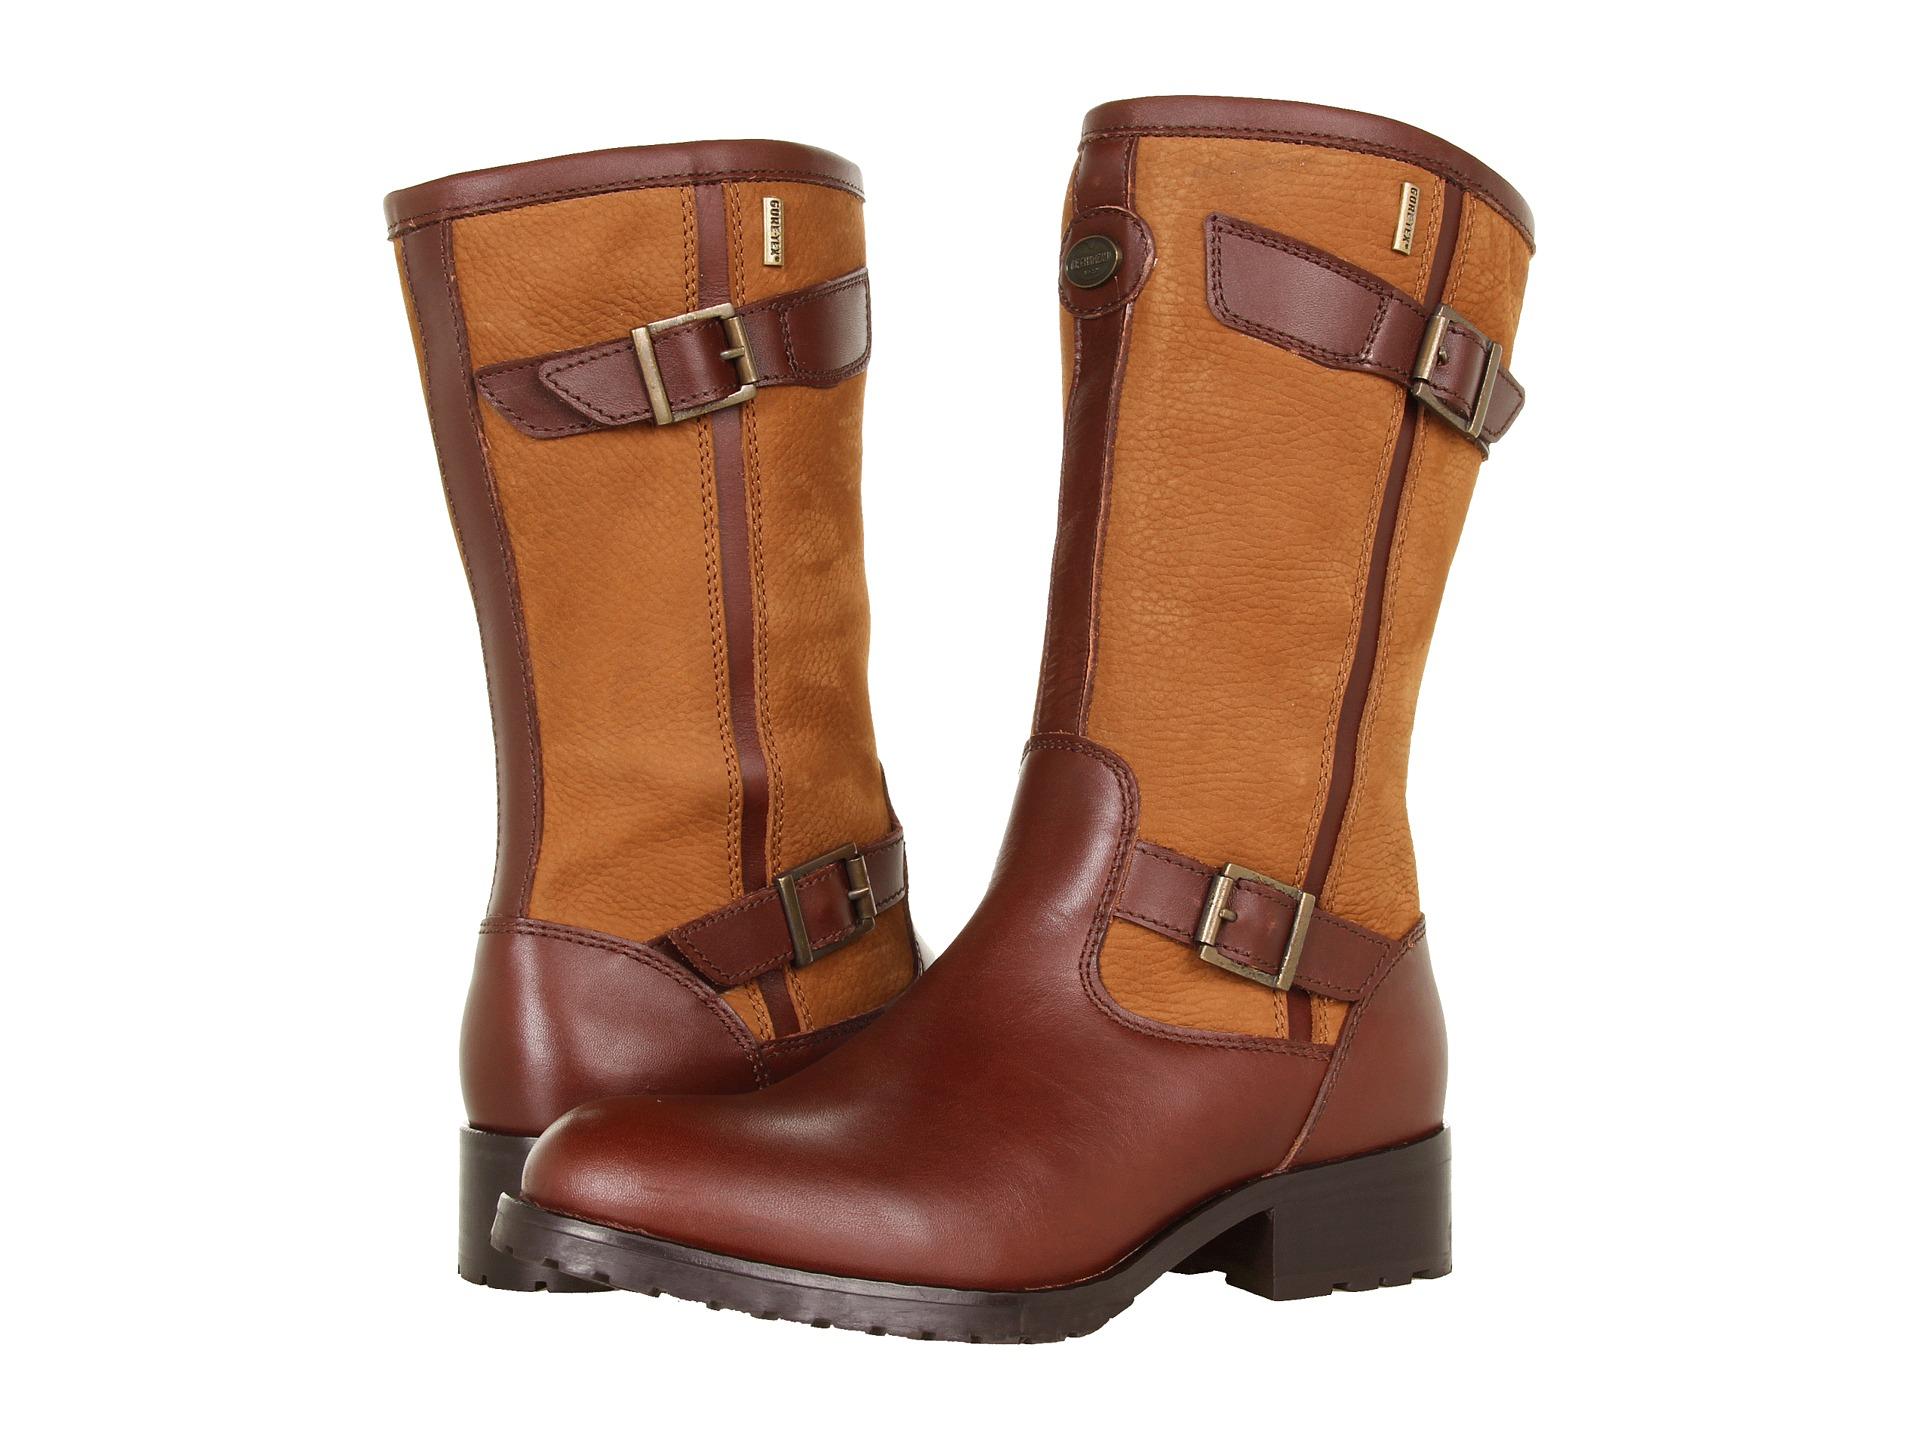 ac25fbf4407 Lyst - Le Chameau Jameson Lady Low Zip Gtx® in Brown